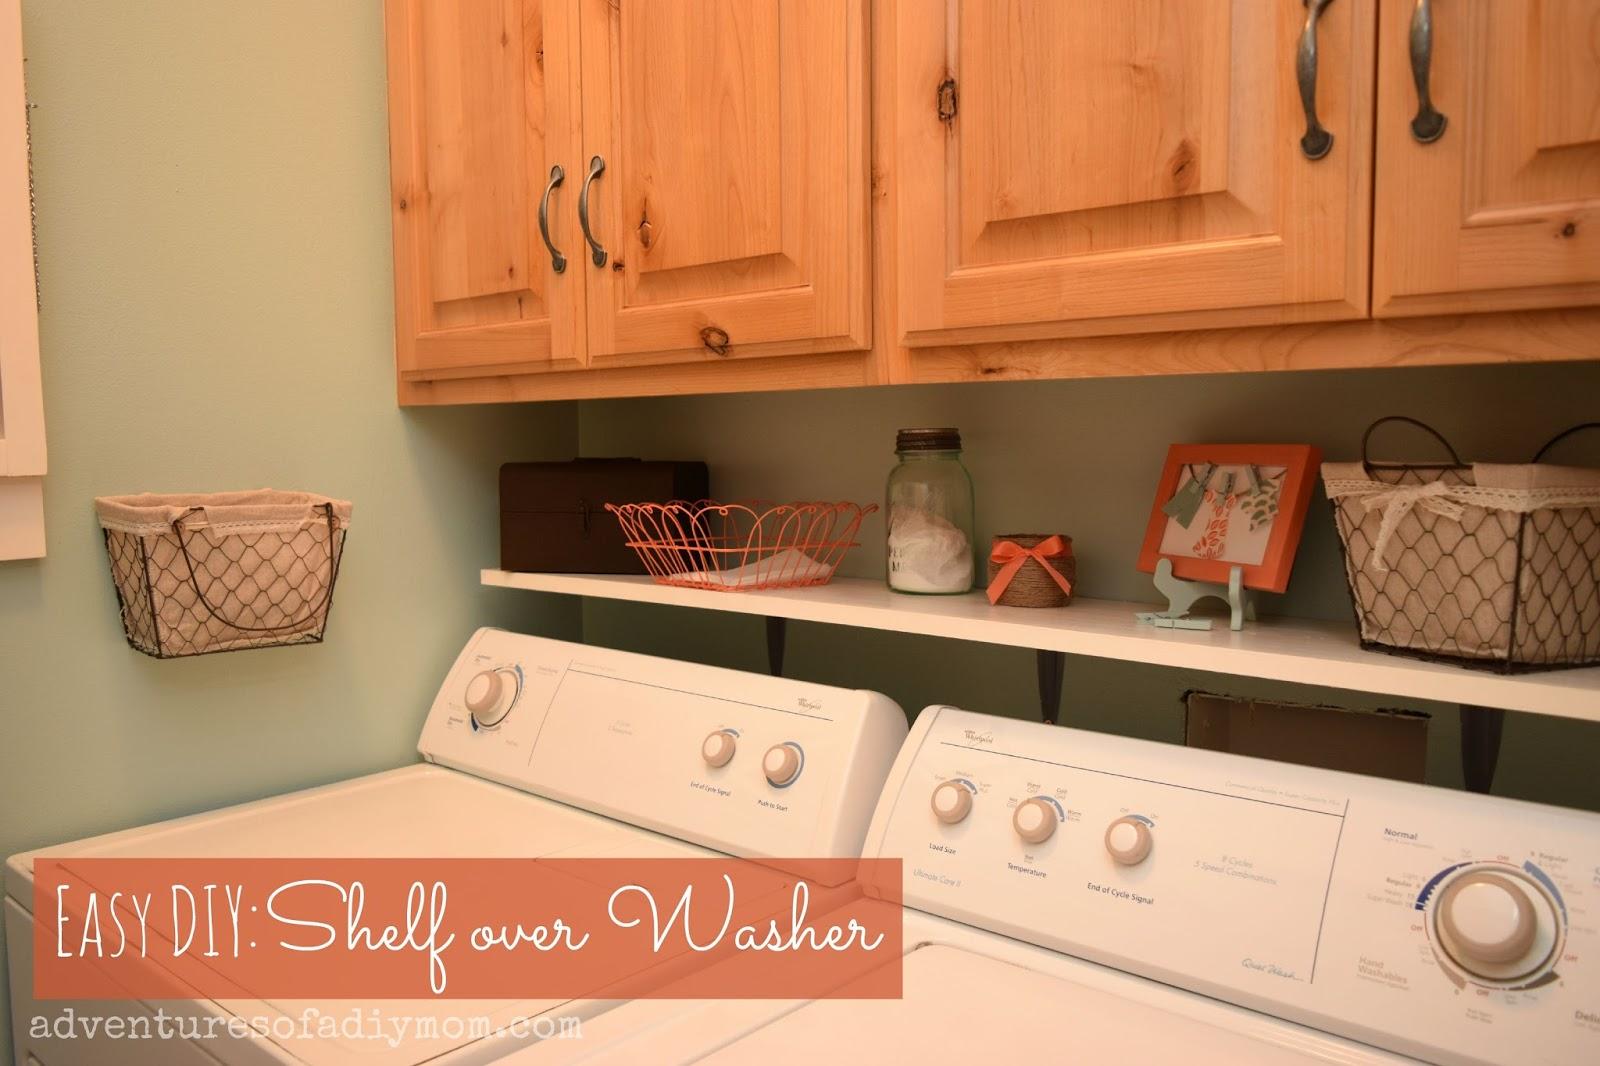 Easy Diy Shelf Over The Washer